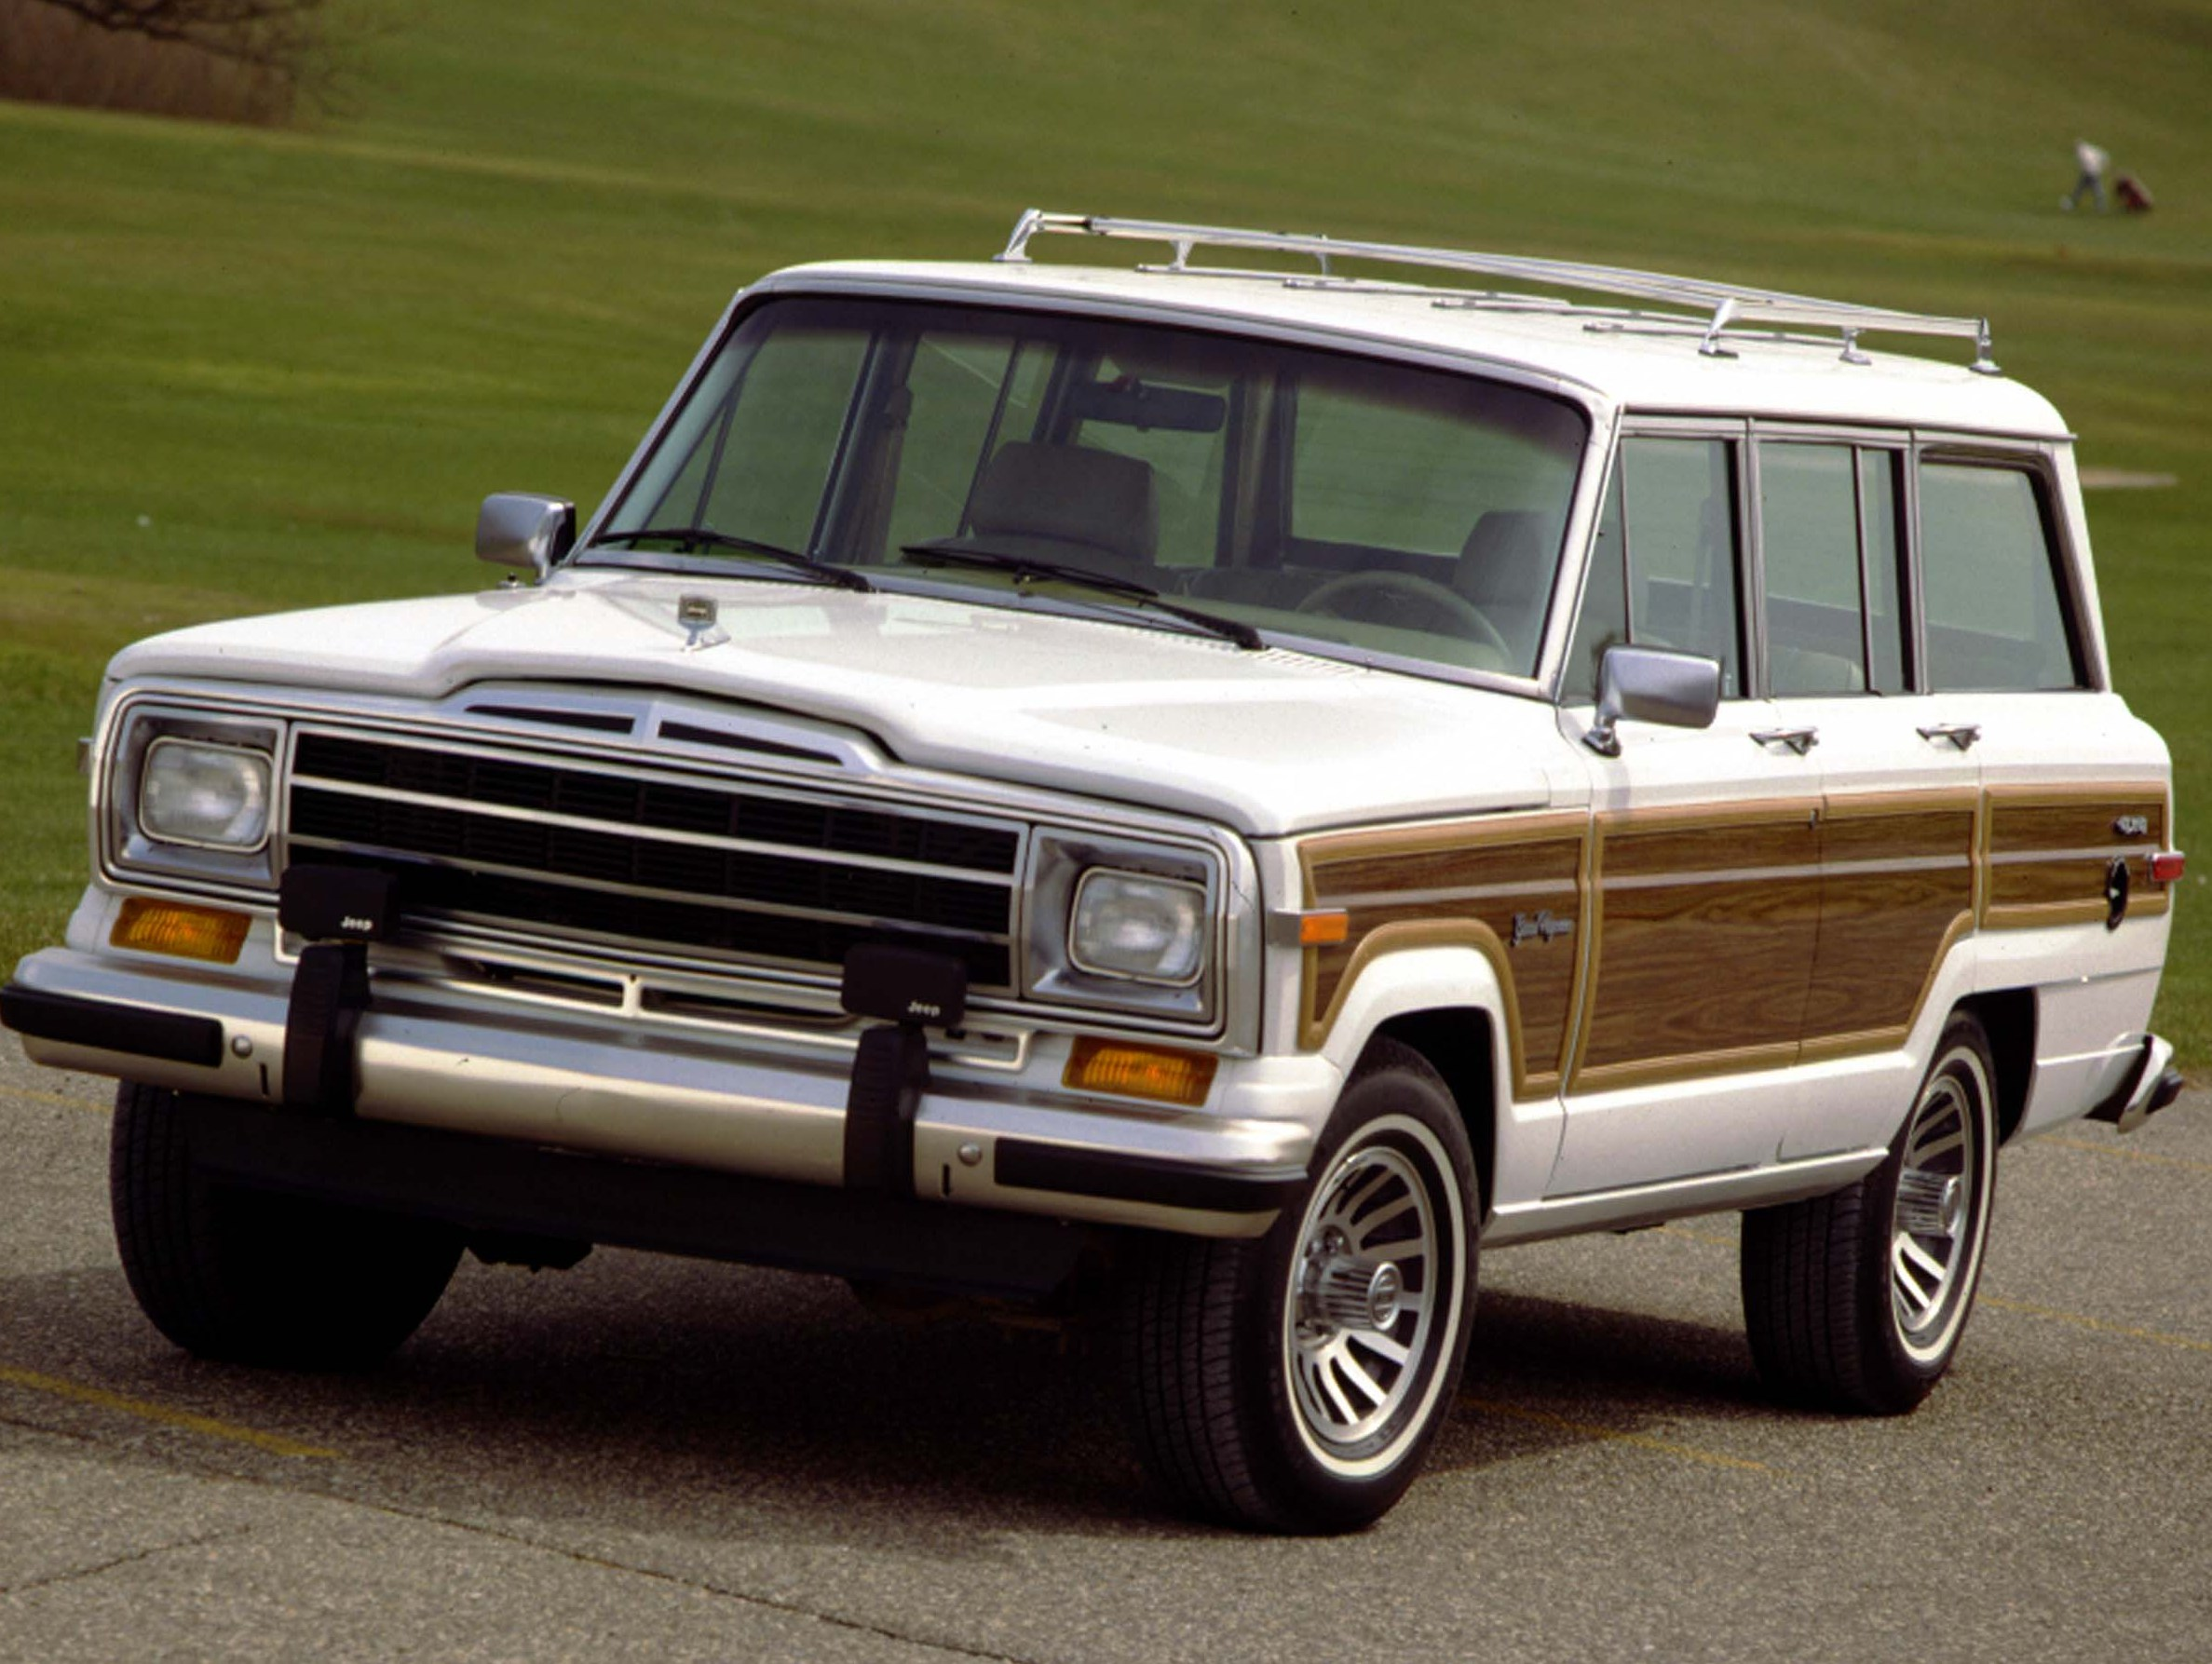 Wagoneer Ho Jeep Confirms Return Of Legendary Suv Fox News